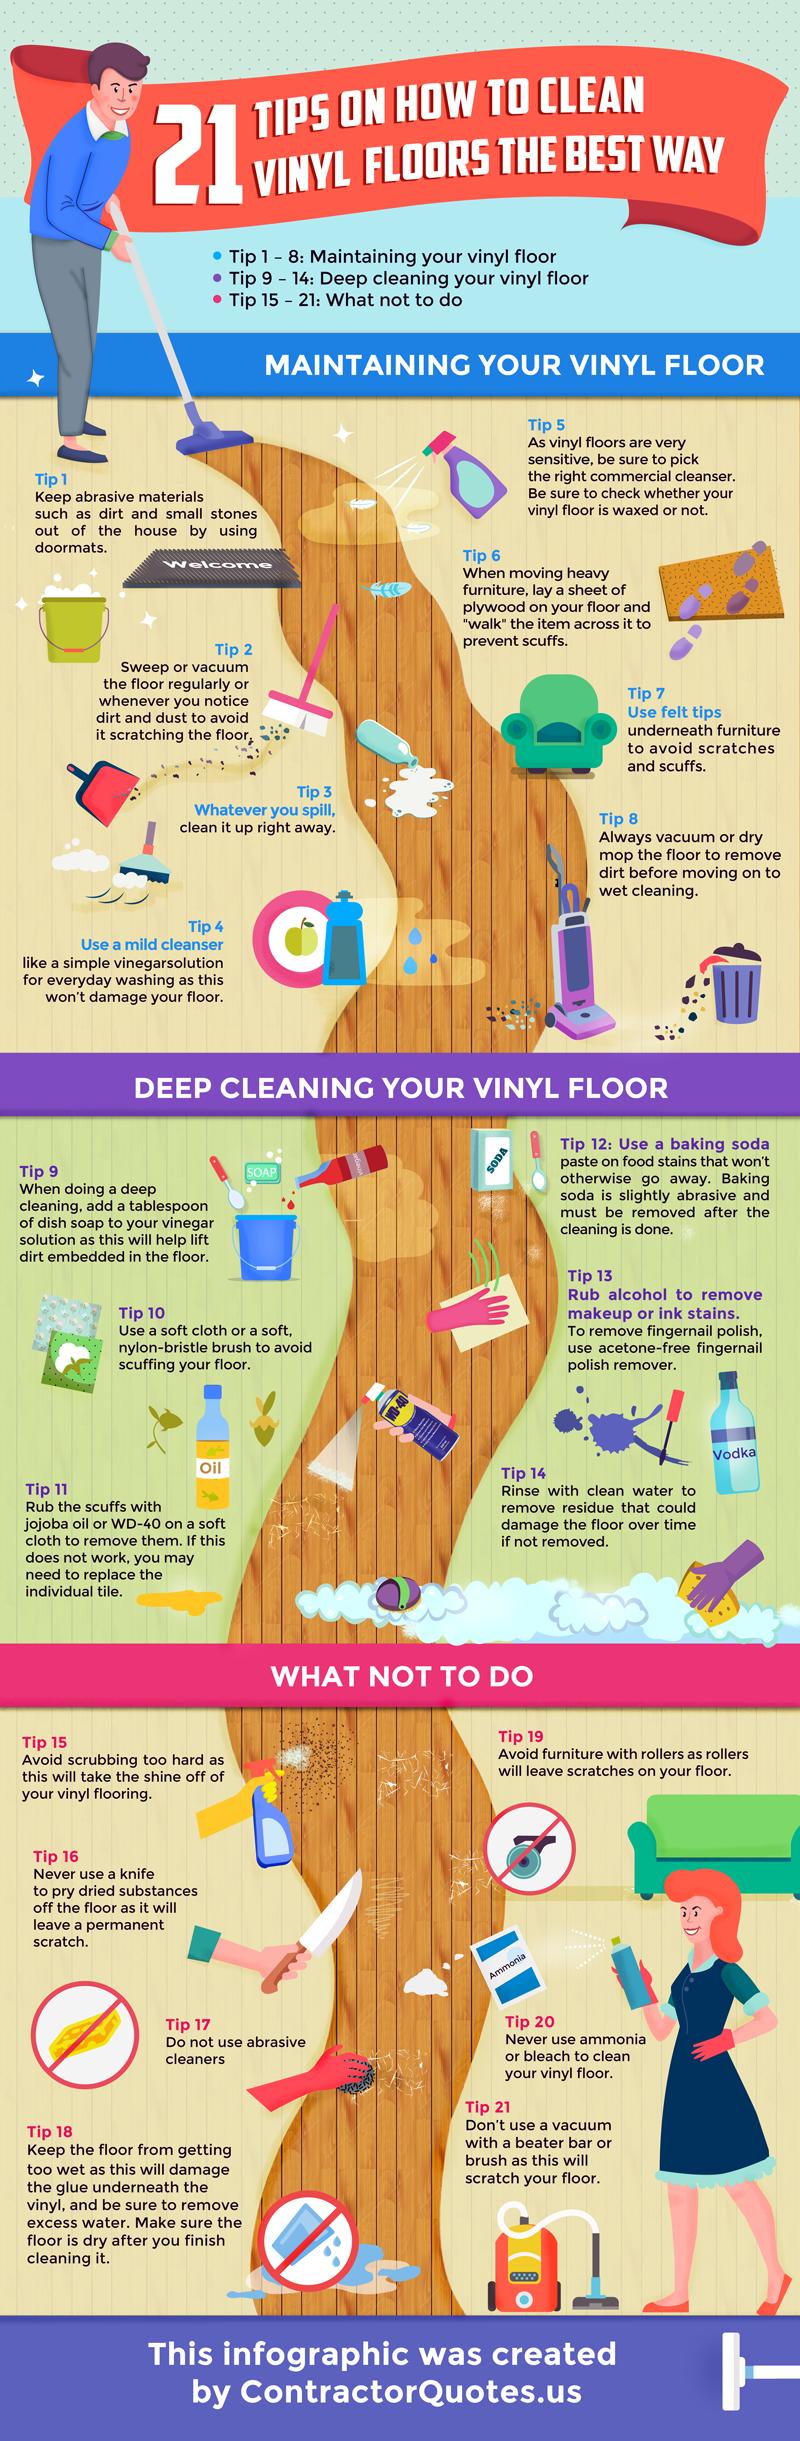 How to clean vinyl plank floors the best way infographicg how to clean vinyl plank floors the best way infographicg dailygadgetfo Image collections